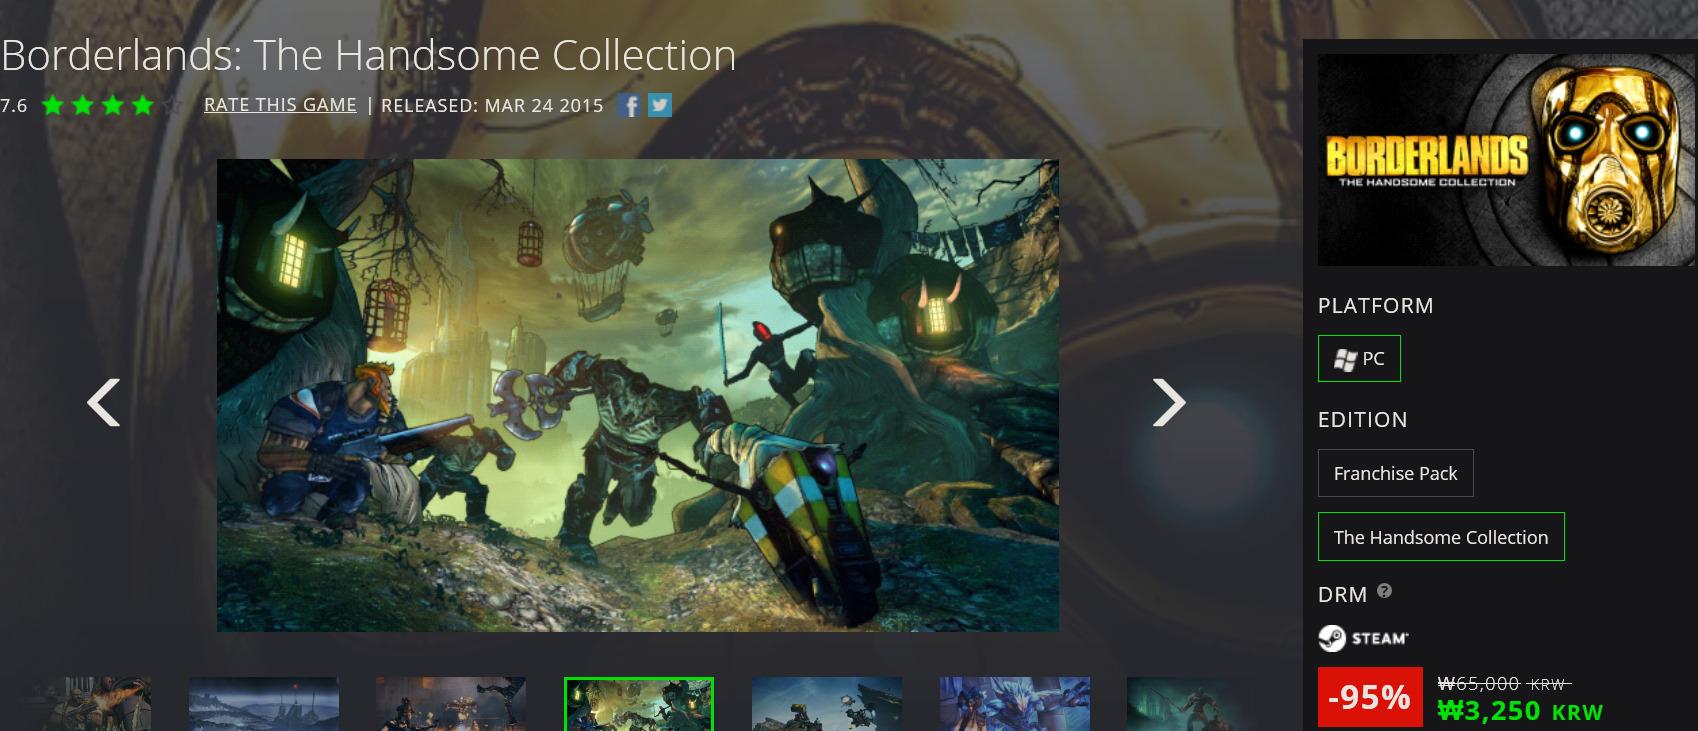 Screenshot_2019-06-15 Borderlands The Handsome Collection PC - Steam Game Keys.jpg